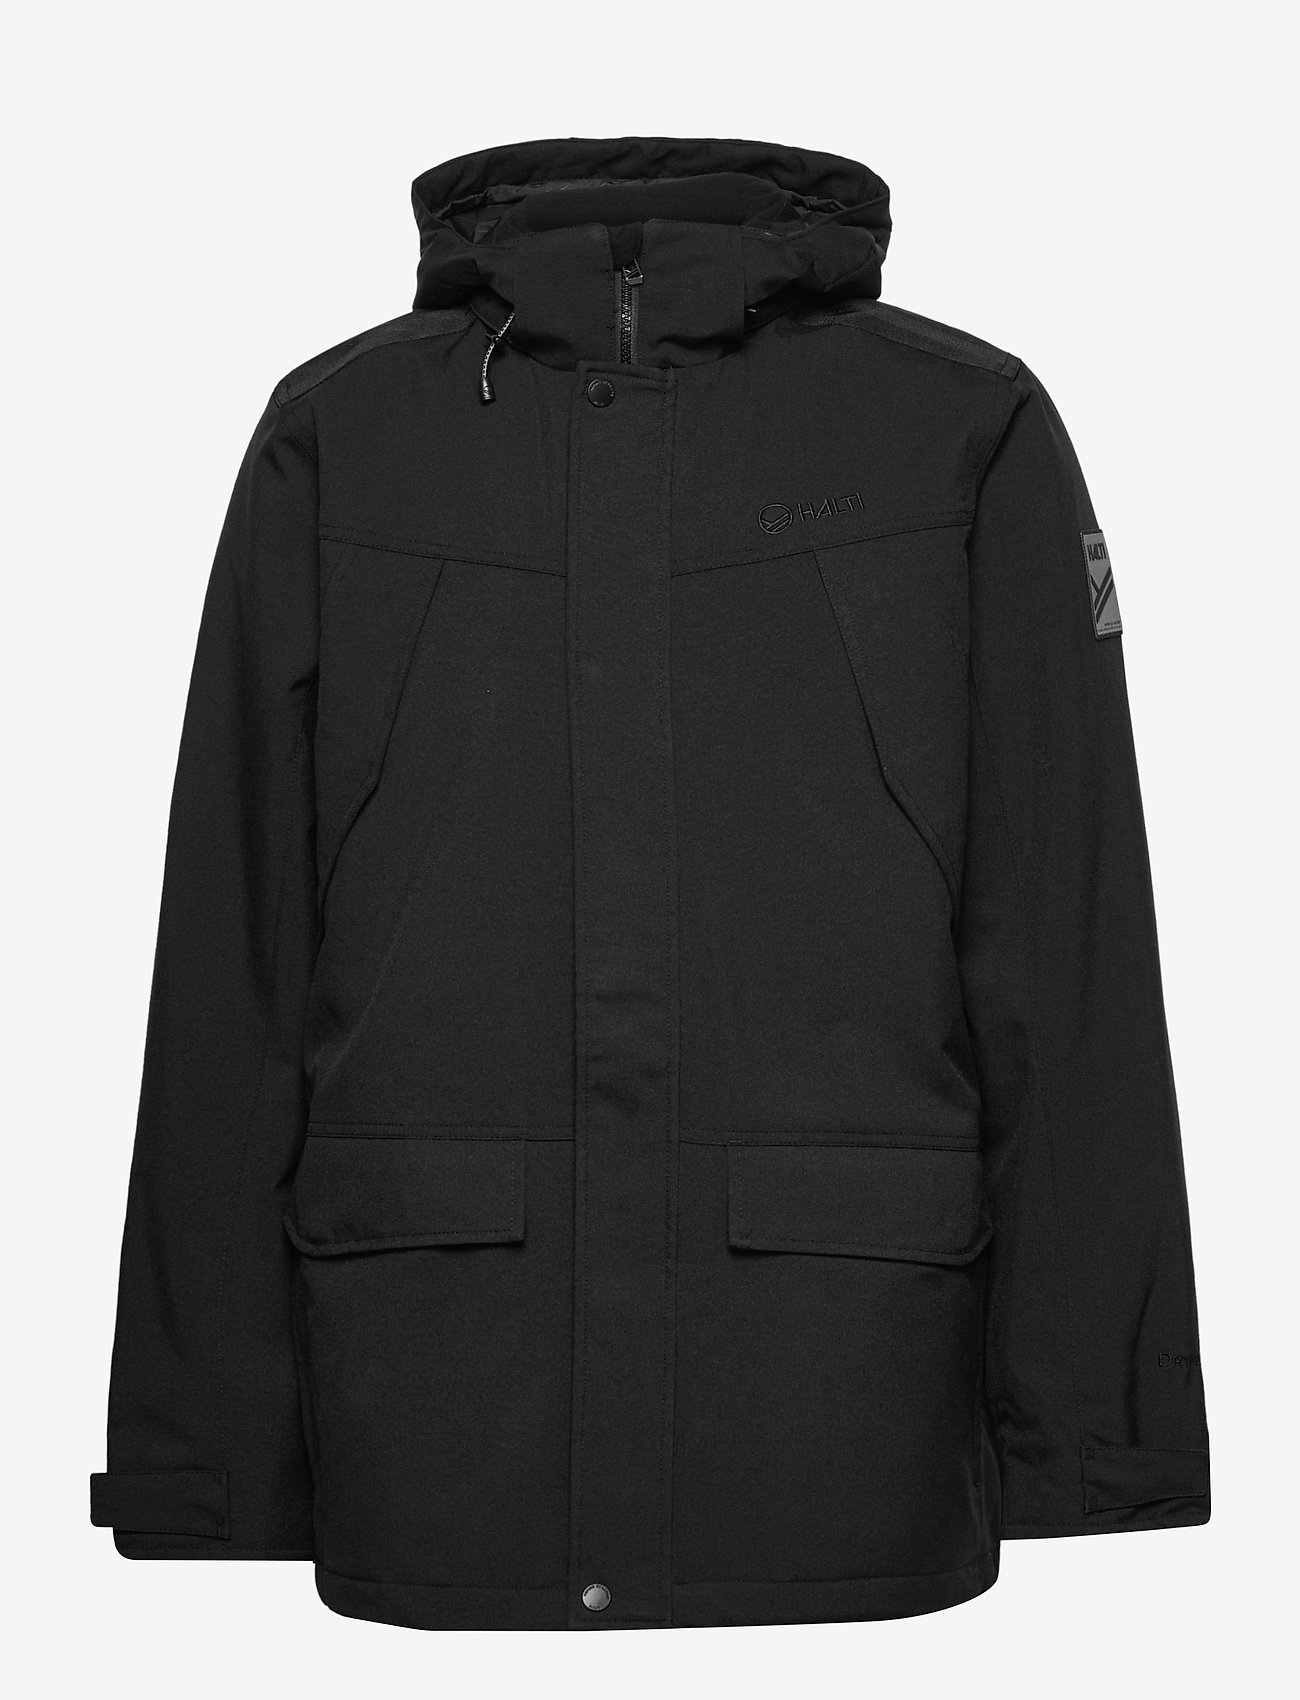 Halti - Luosto Men's Warm parka jacket - parkas - black - 1